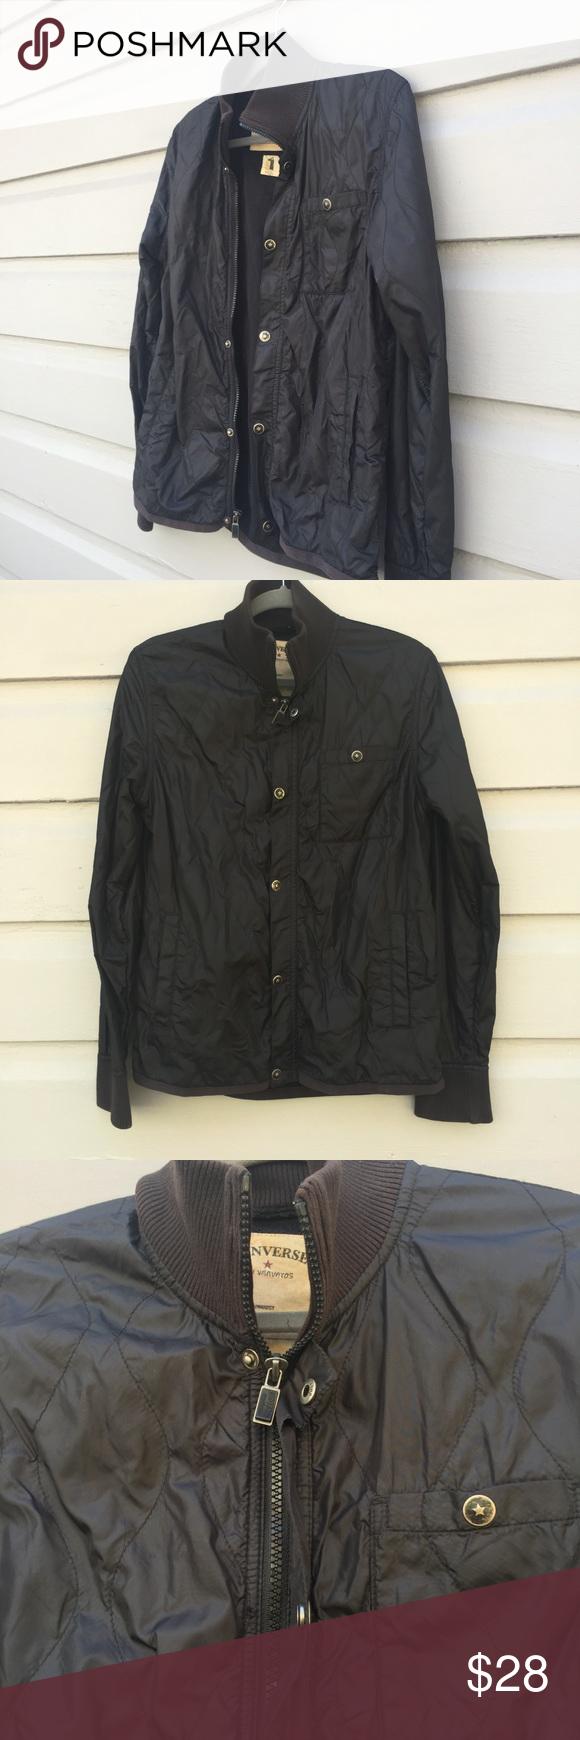 4e9bc4643053 Vintage Women s Converse Black Jacket Large